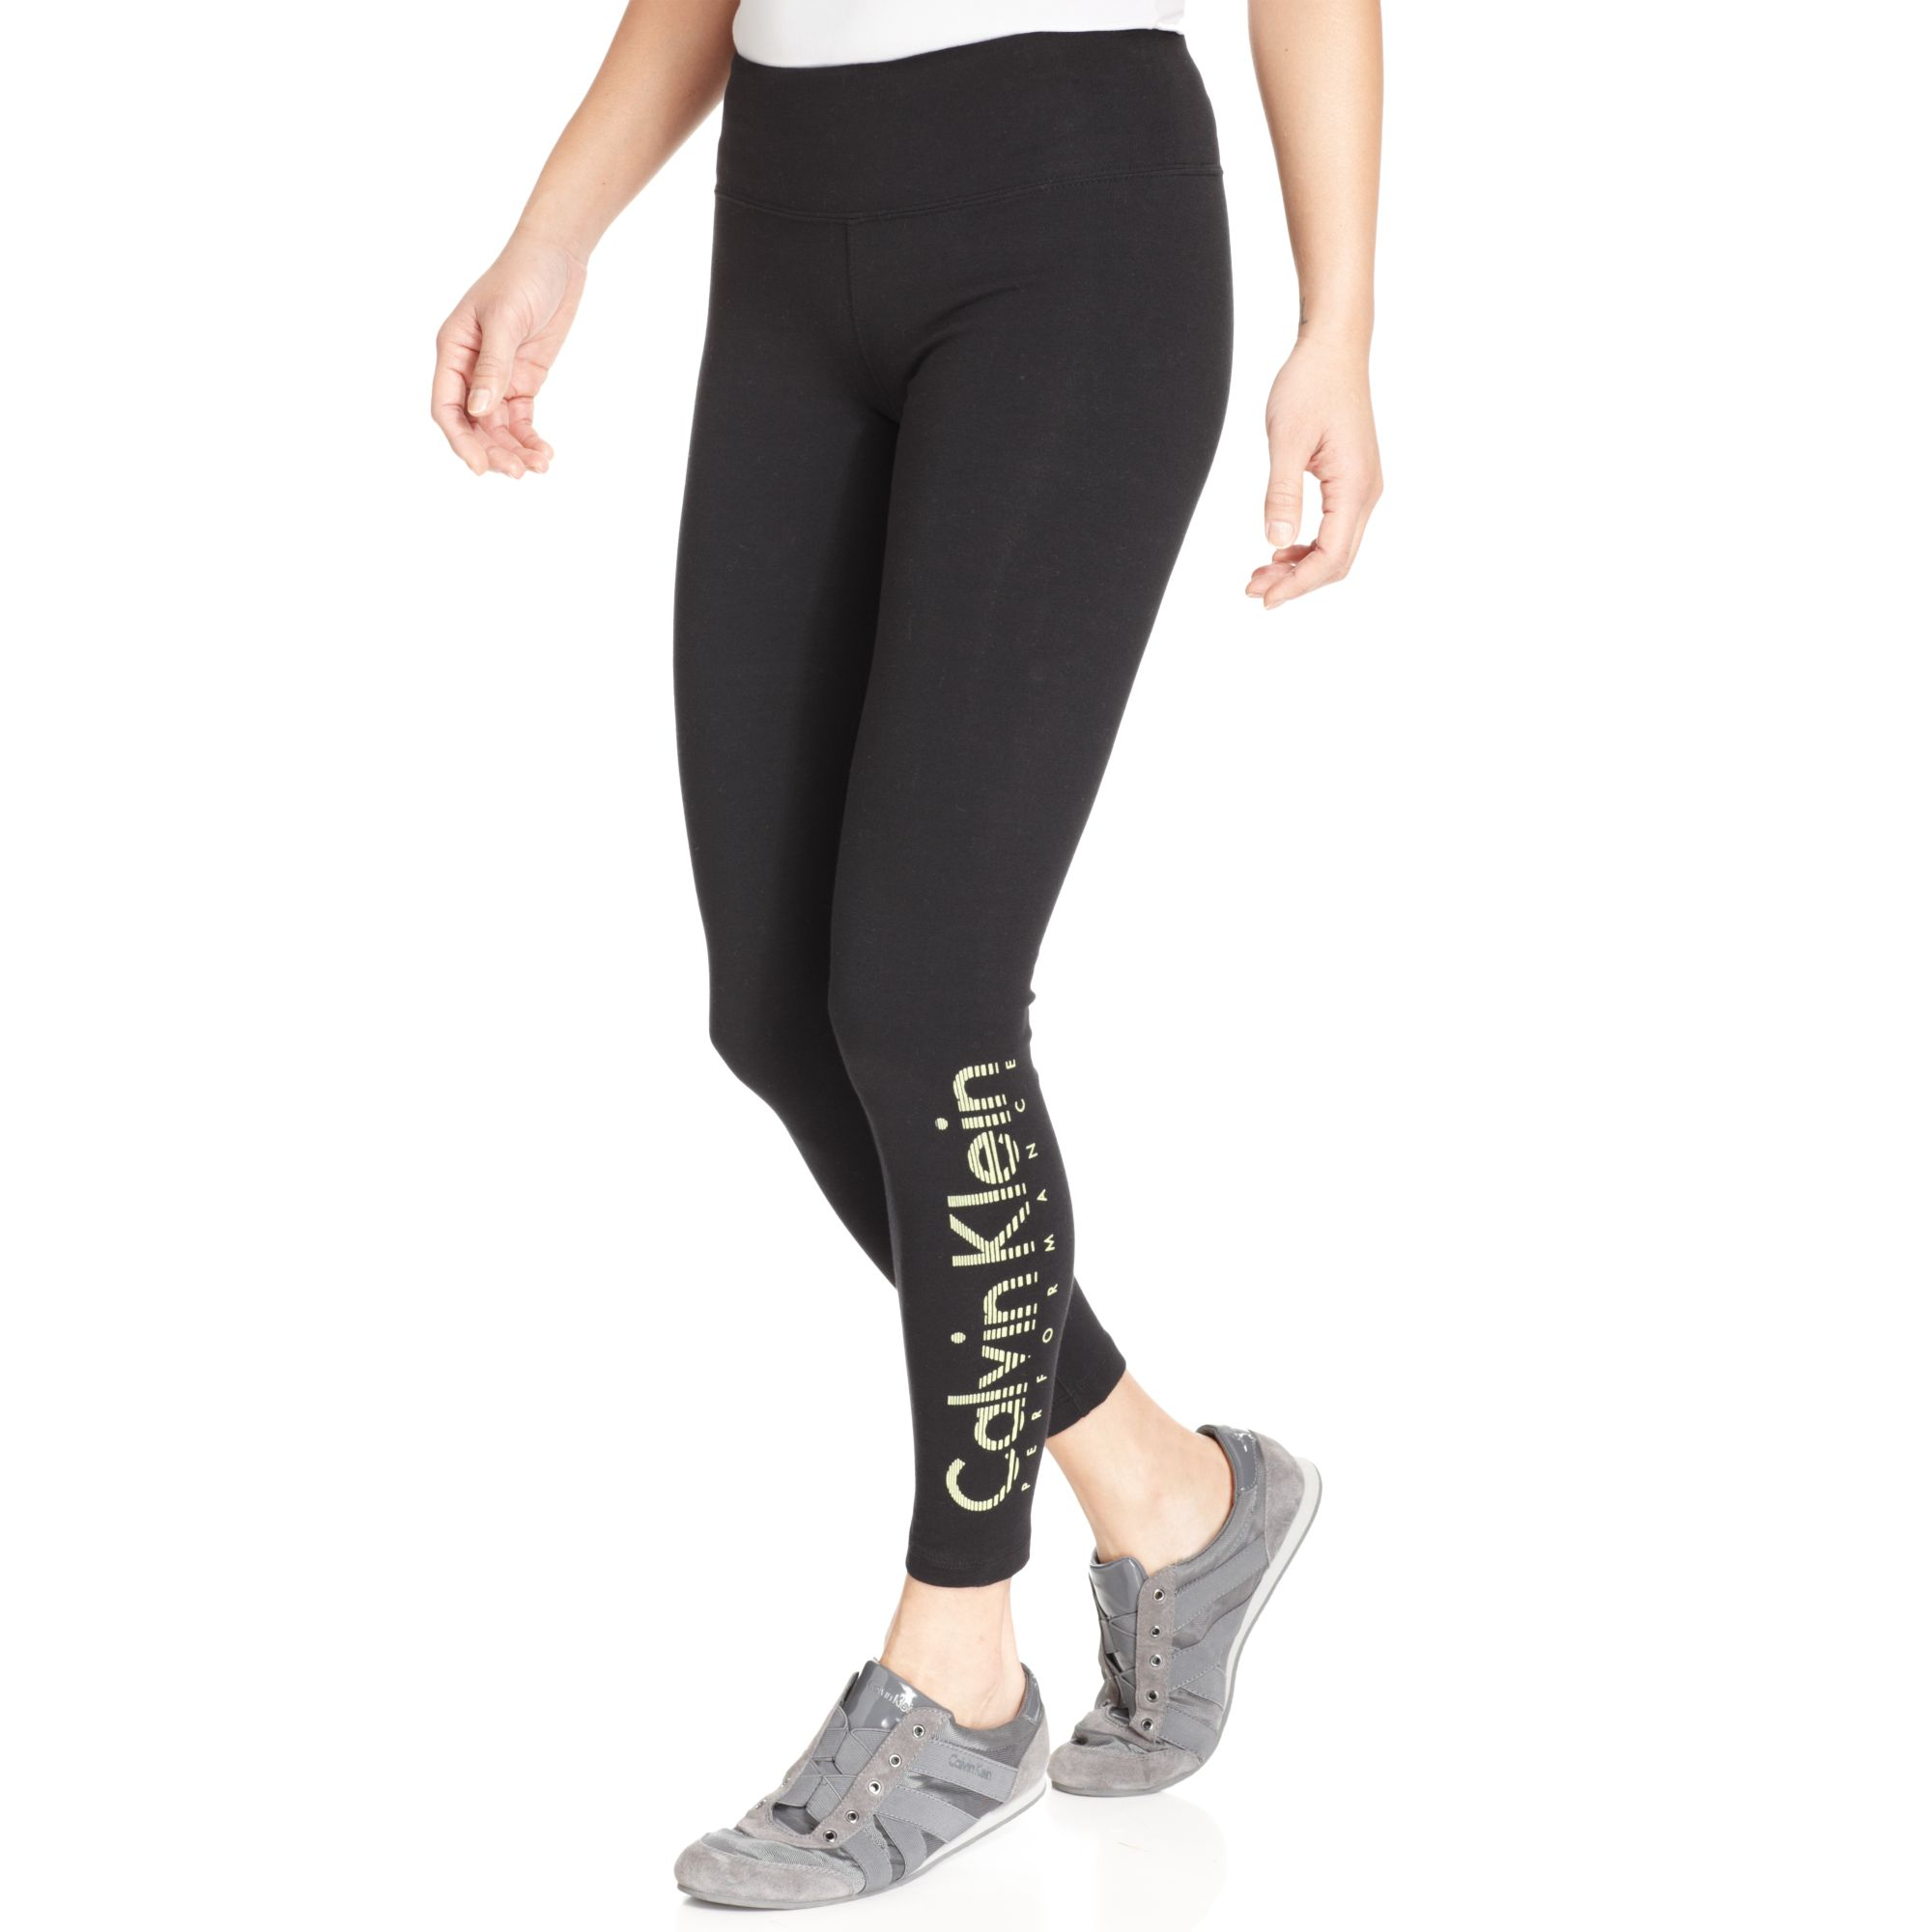 4b04765a6f8 Lyst - Calvin Klein Quickdry Logo Leggings in Black